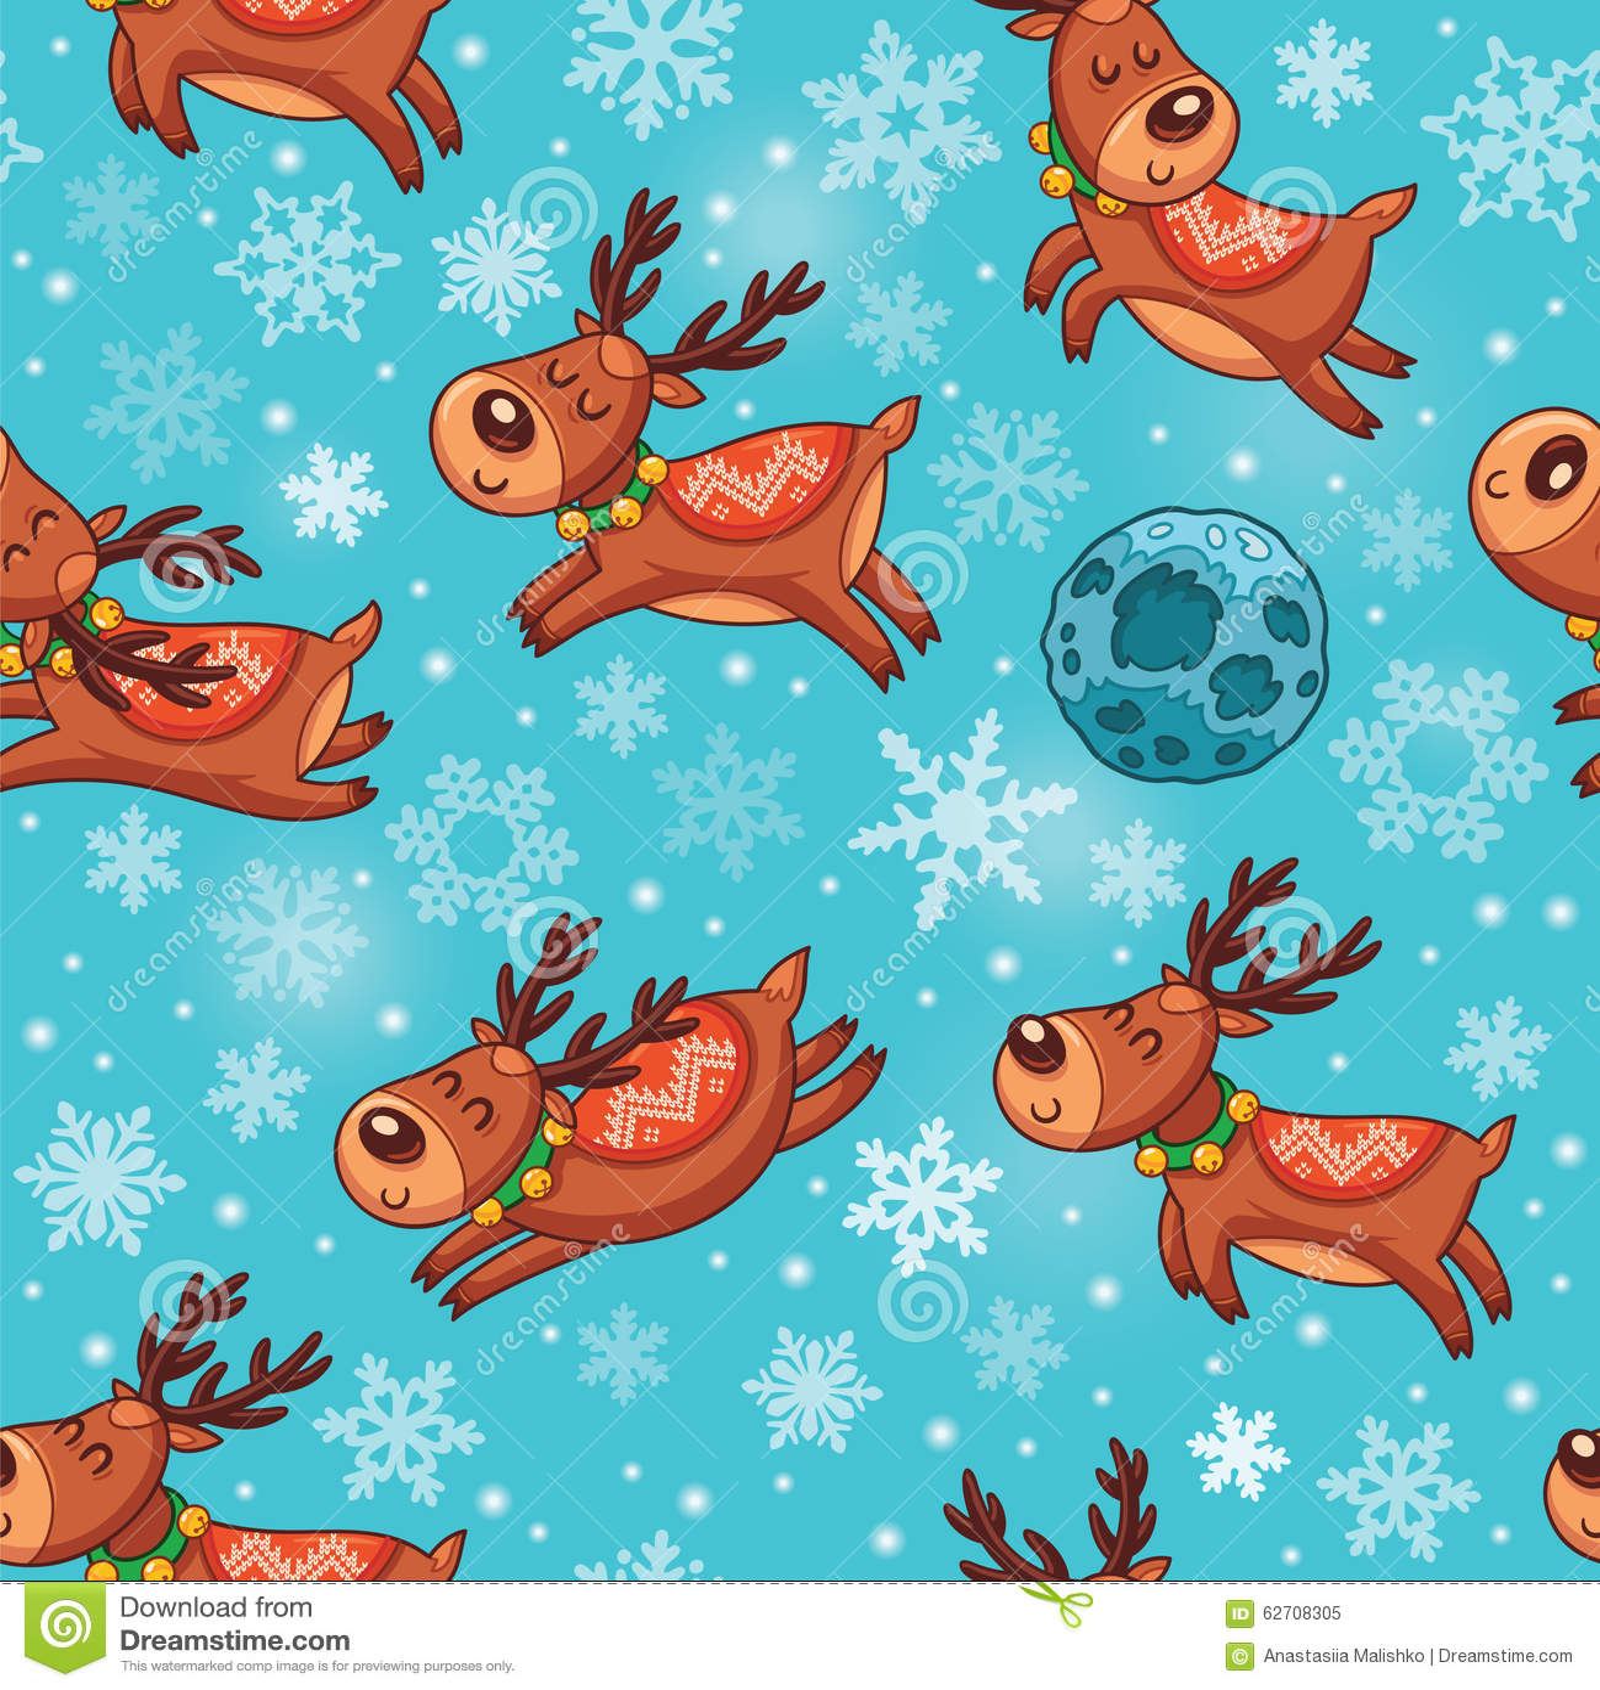 Deers Χριστουγέννων στο άνευ ραφής σχέδιο κινούμενων σχεδίων